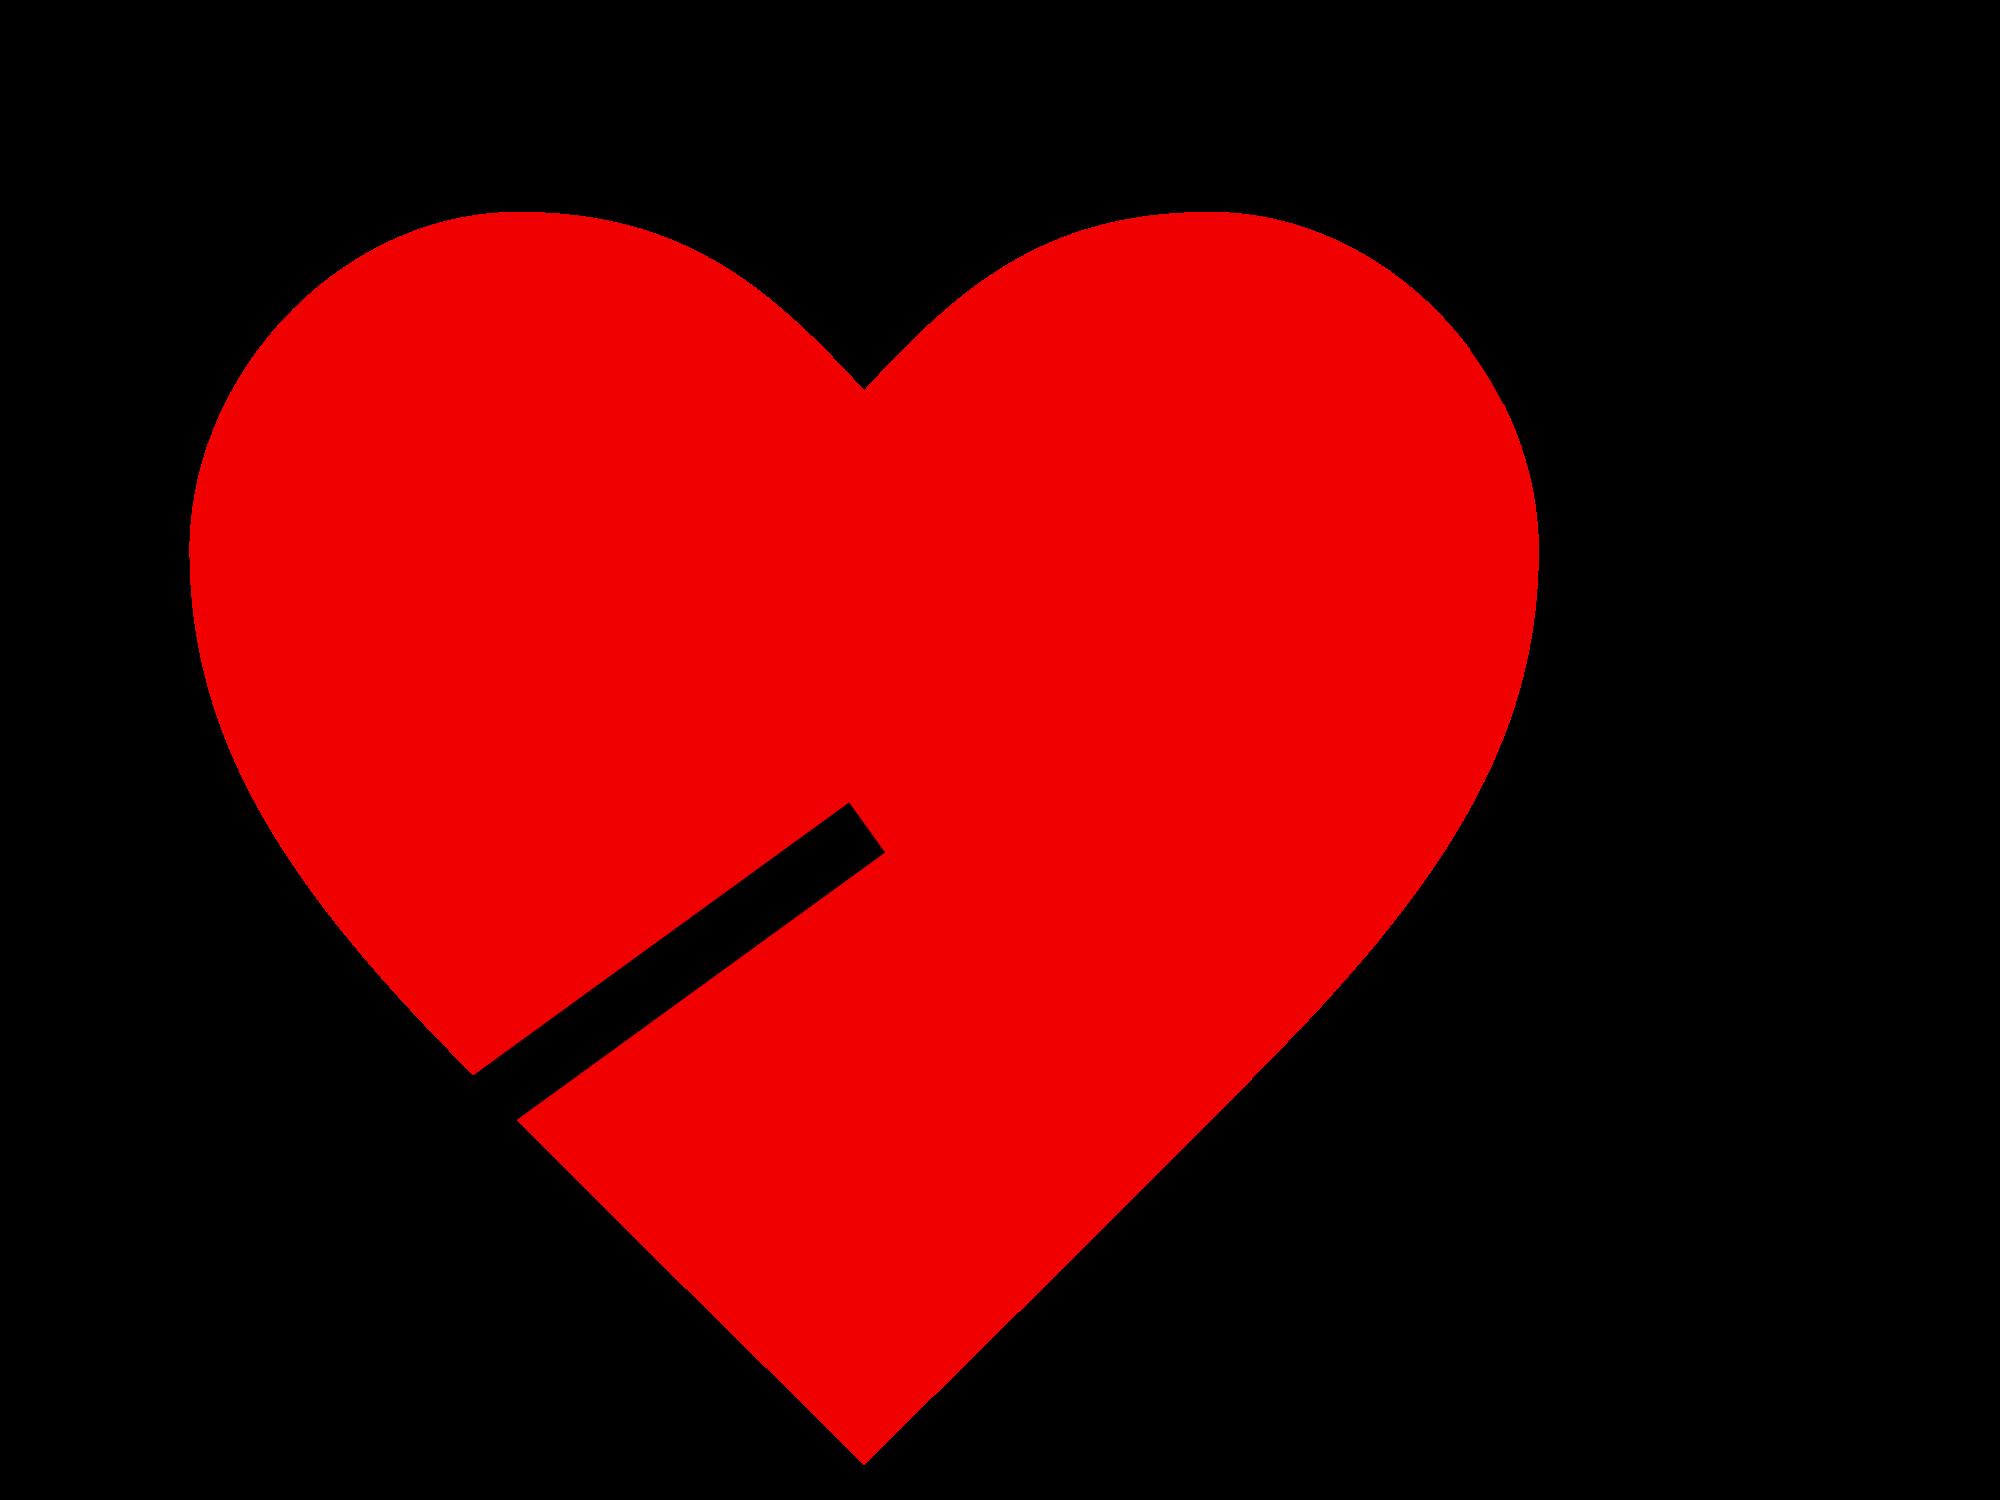 Clipart Arrow With Heart In 2021 Heart Symbol Heart With Arrow Clip Art